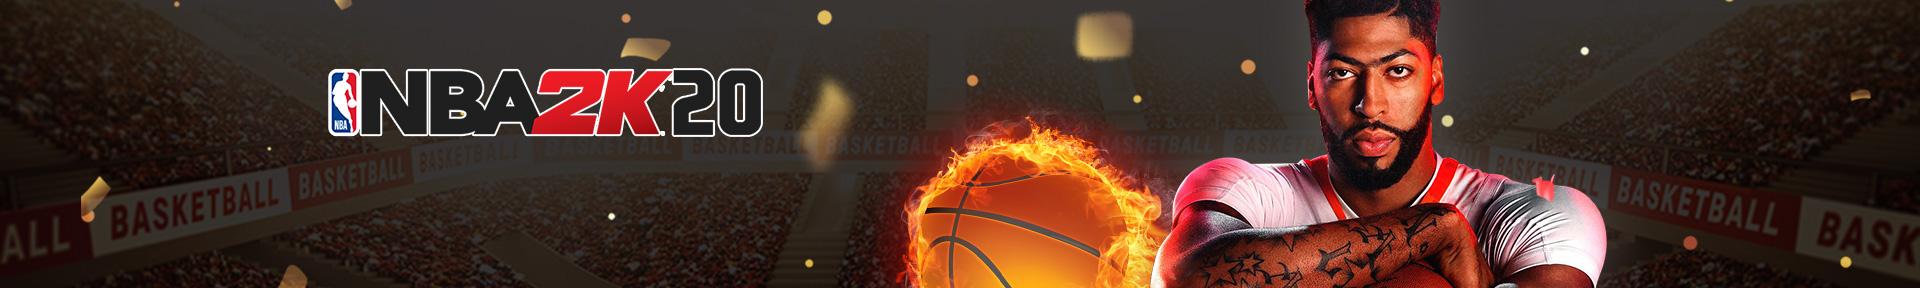 NBA 2K19 VC Boosting